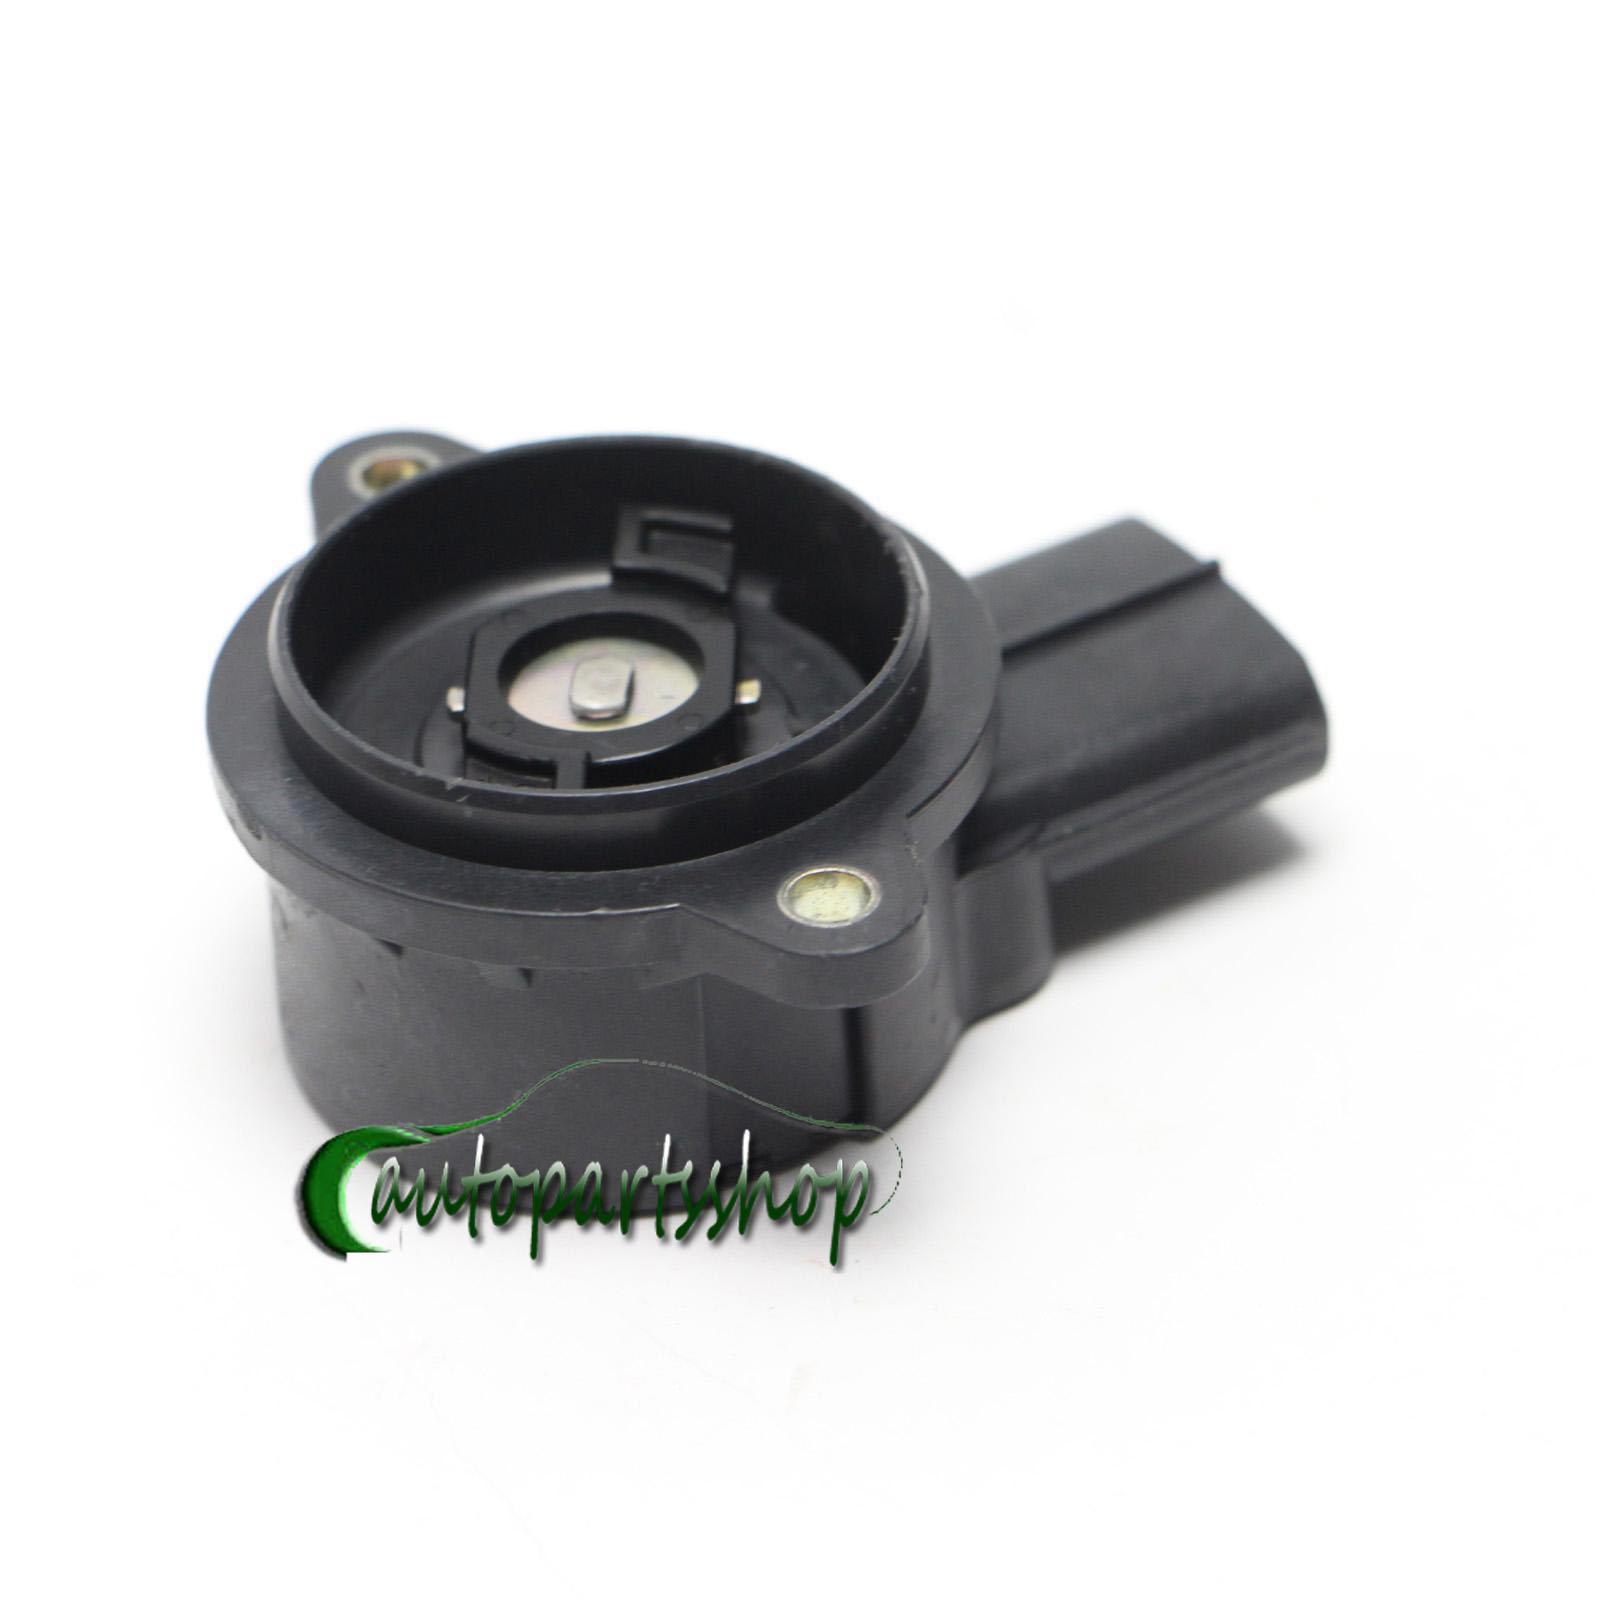 High Quality TPS Case For Toyota Yaris Throttle Position Sensor 89457-52010